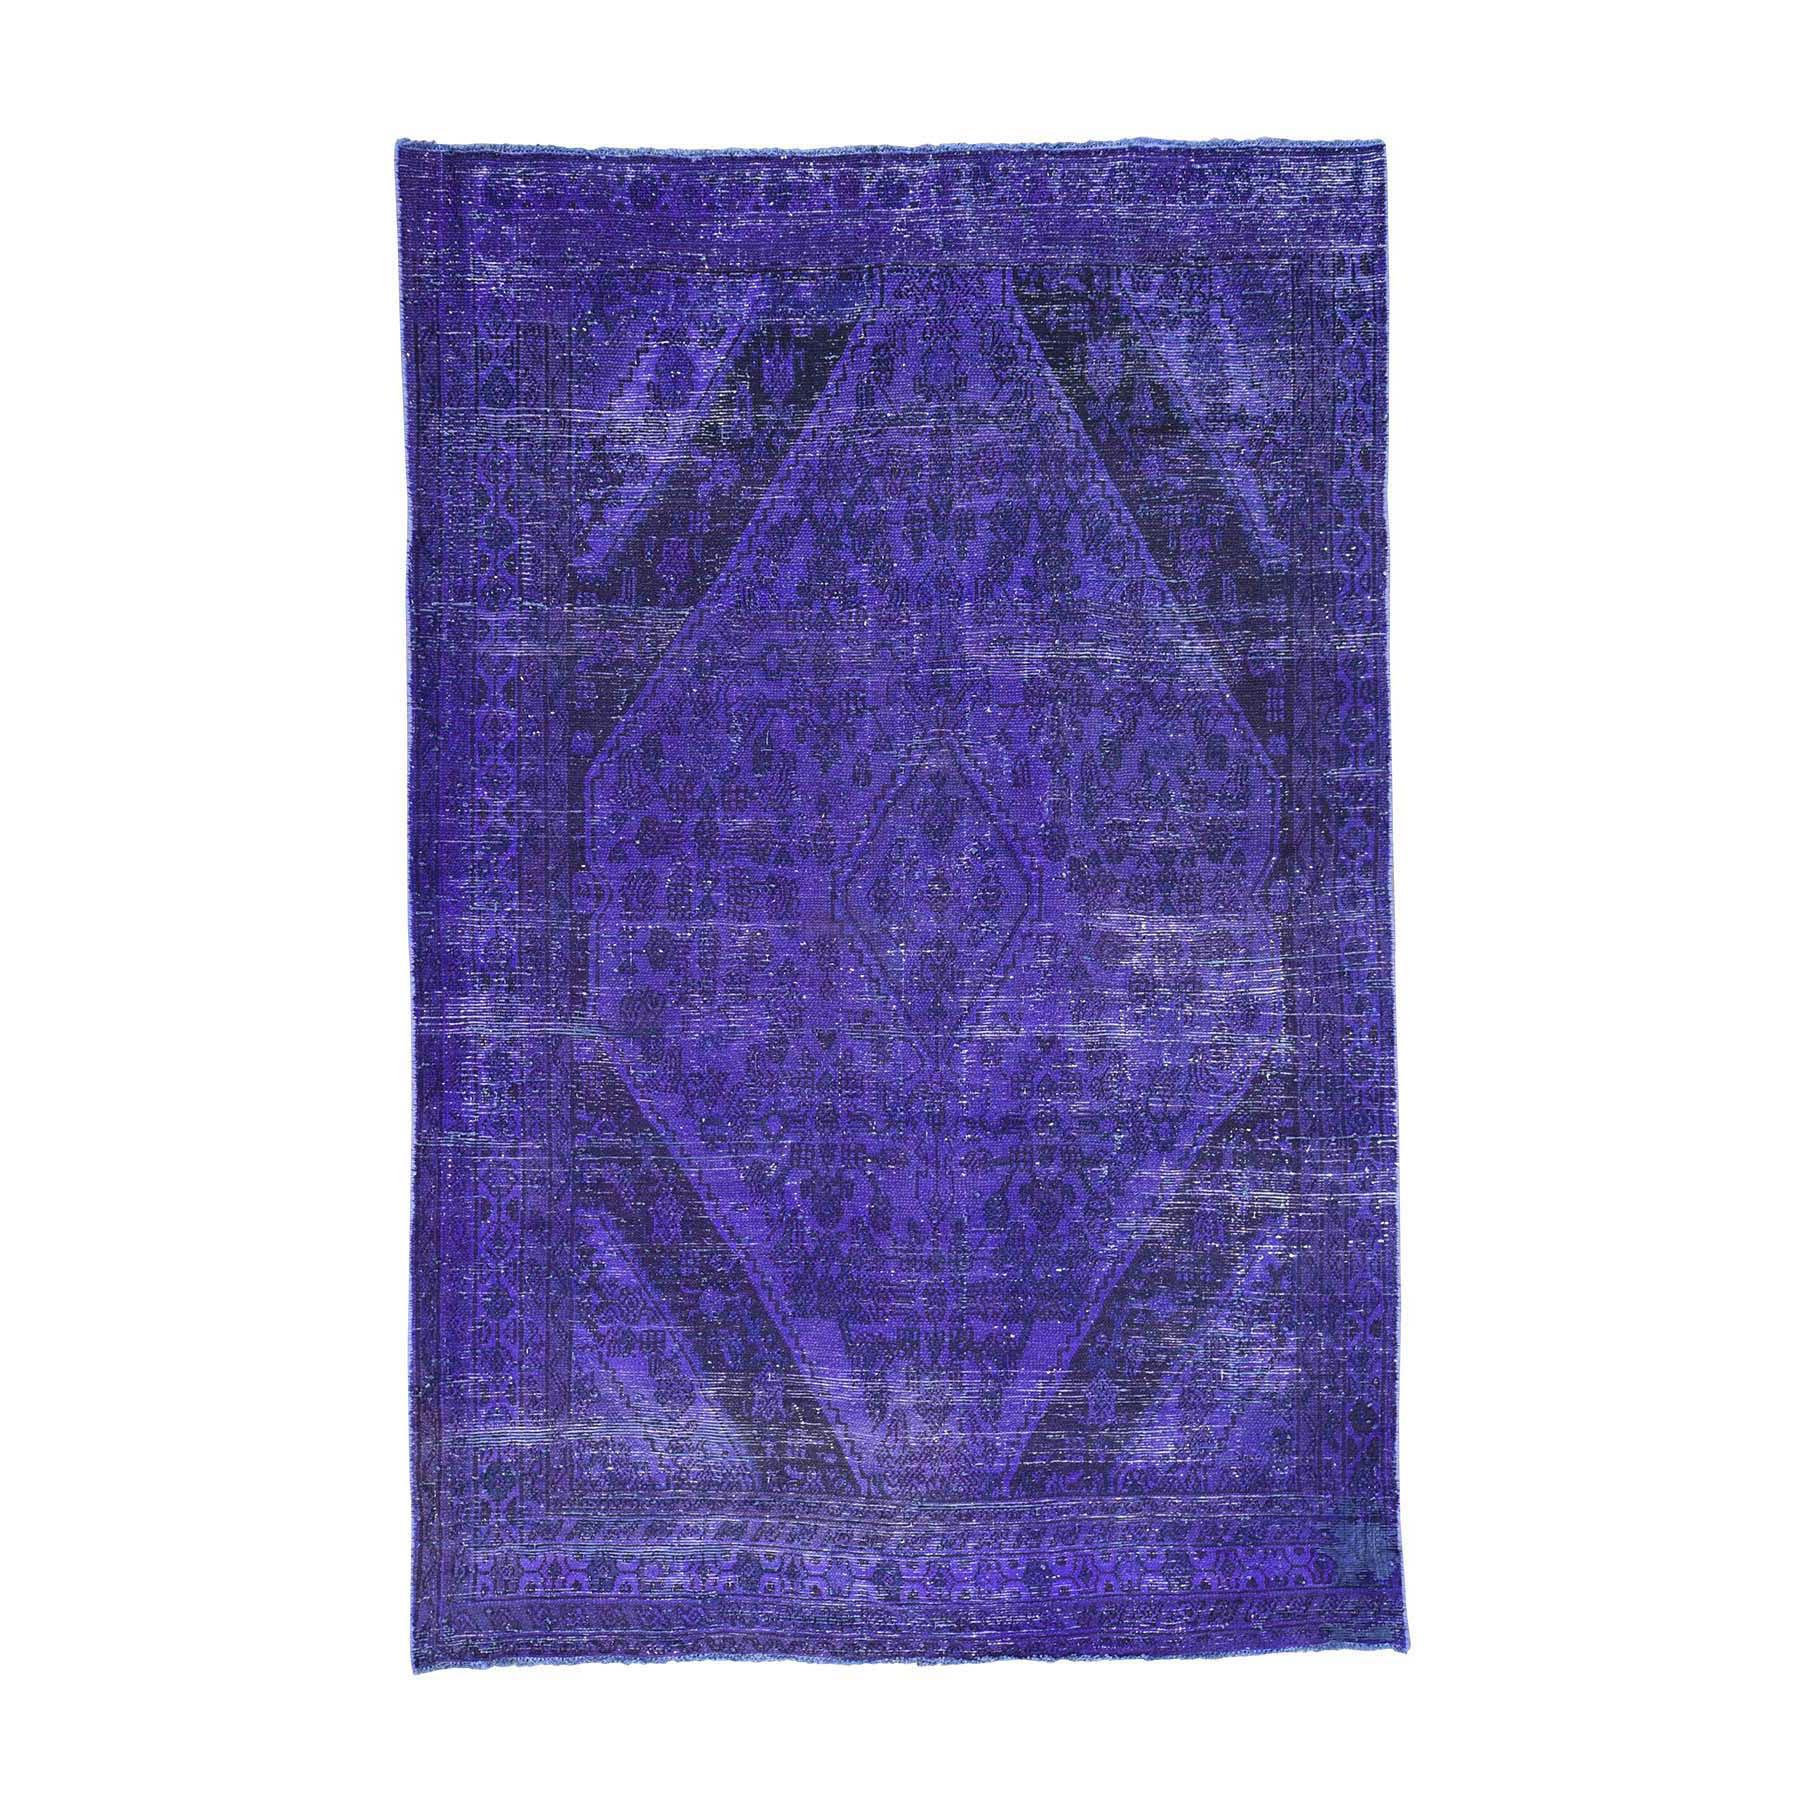 "6'5""X9'10"" Handmade Pure Wool Overdyed Persian Bibikabad Vintage Rug moacd8b7"